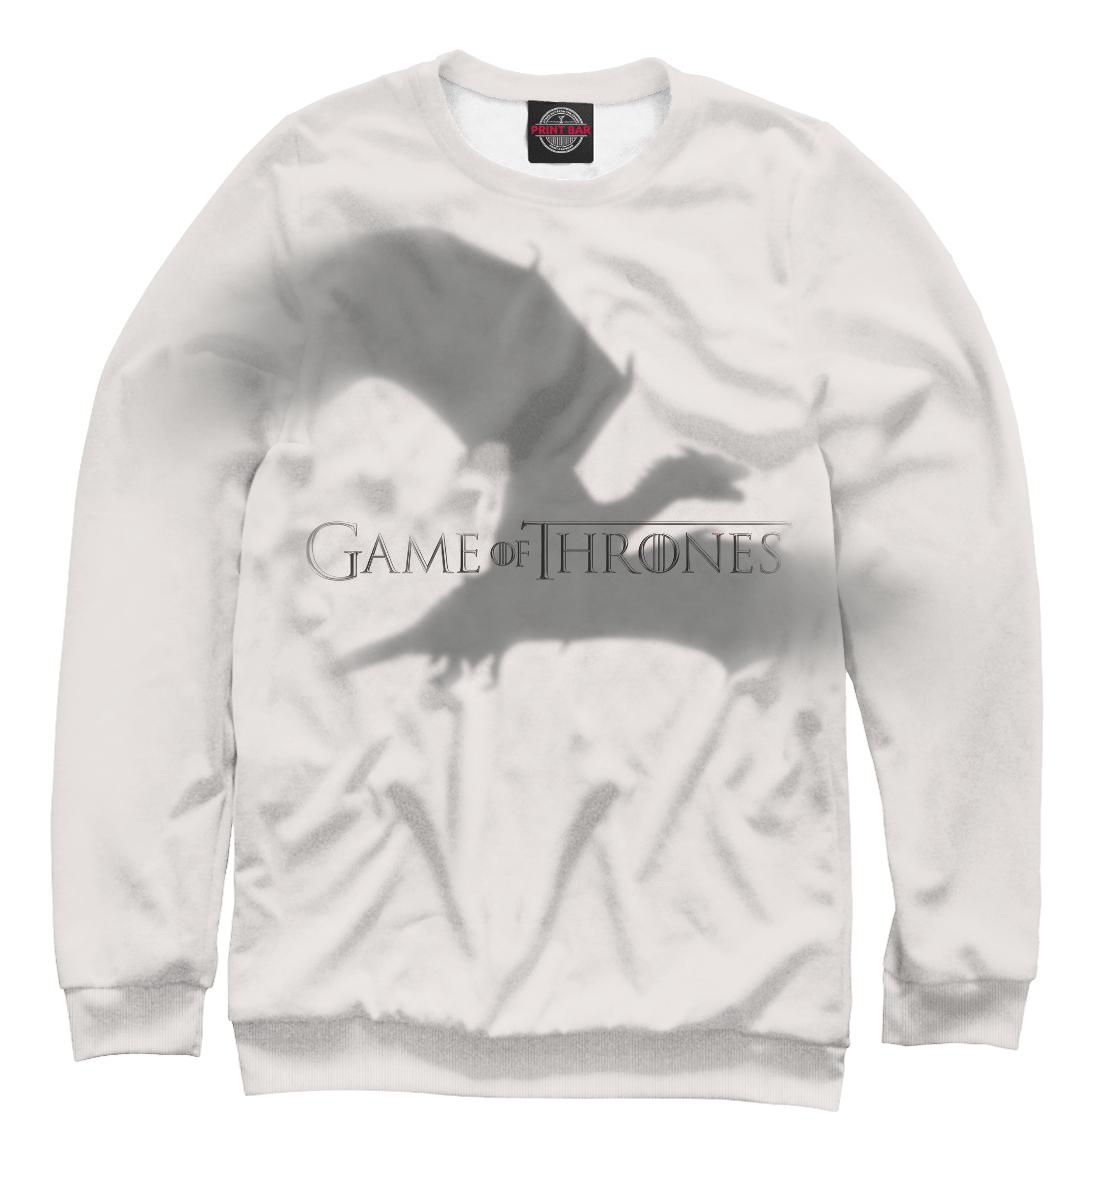 Купить Game Of Thrones Дракон, Printbar, Свитшоты, IGR-330248-swi-1